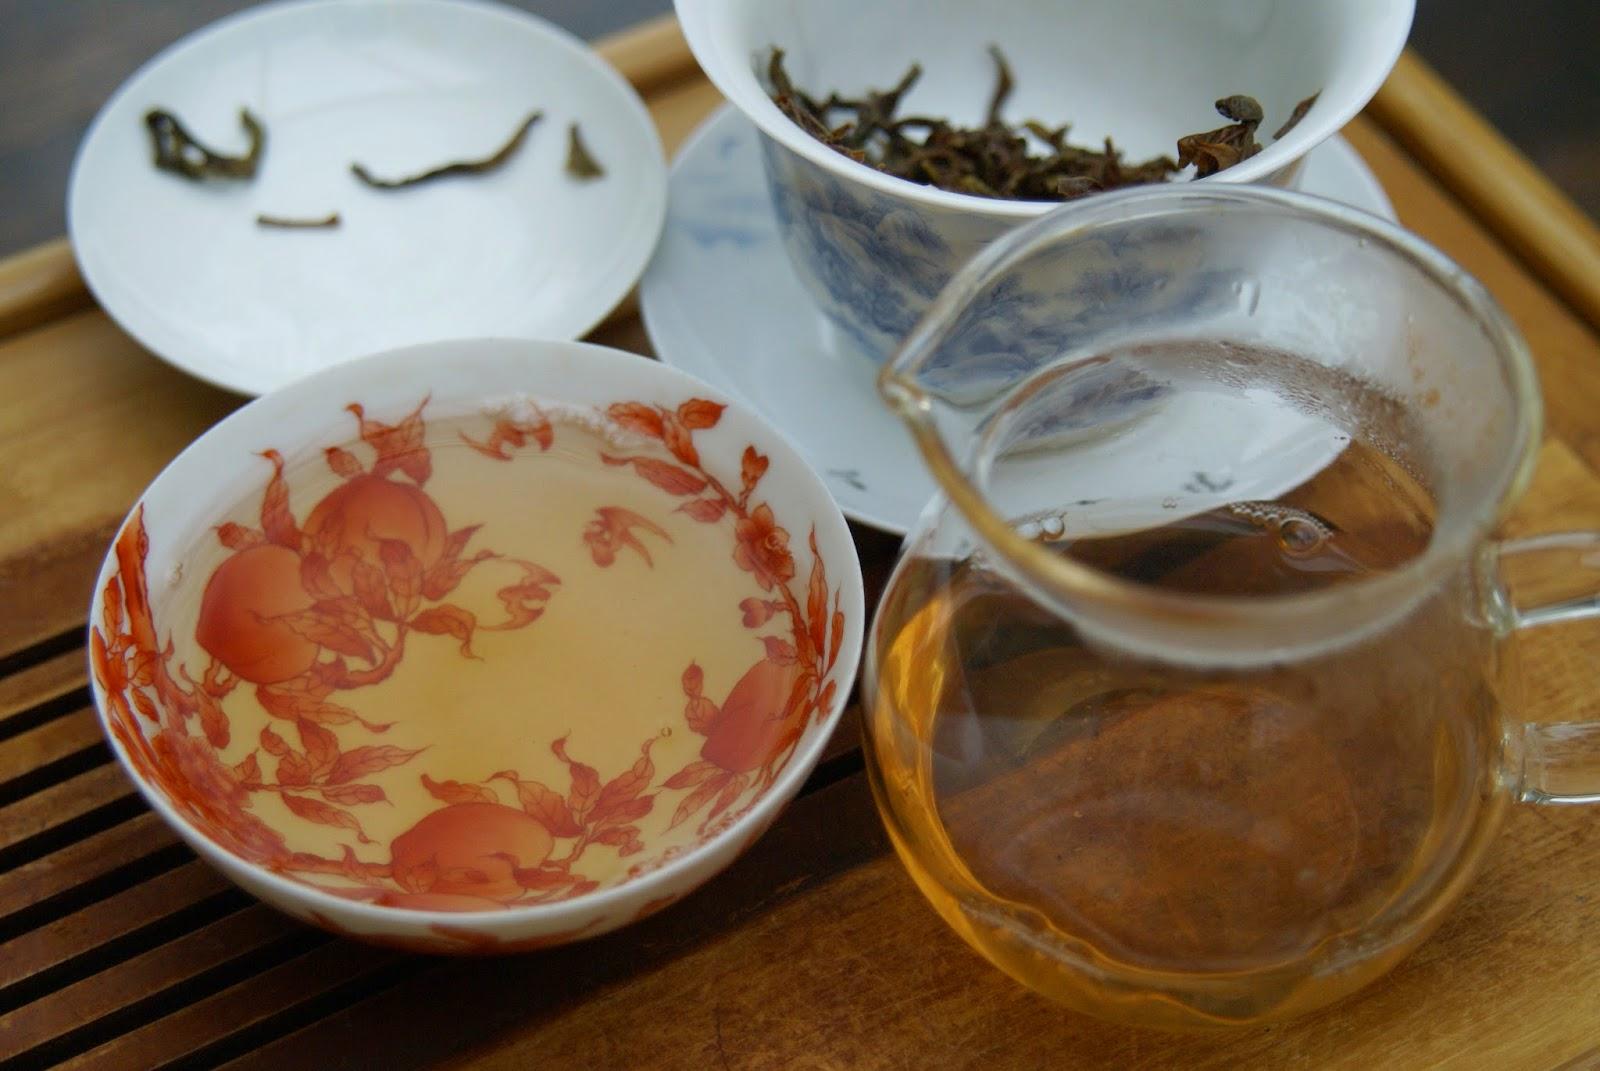 master lin 39 s mi hua xiang postcard teas demysteafication. Black Bedroom Furniture Sets. Home Design Ideas